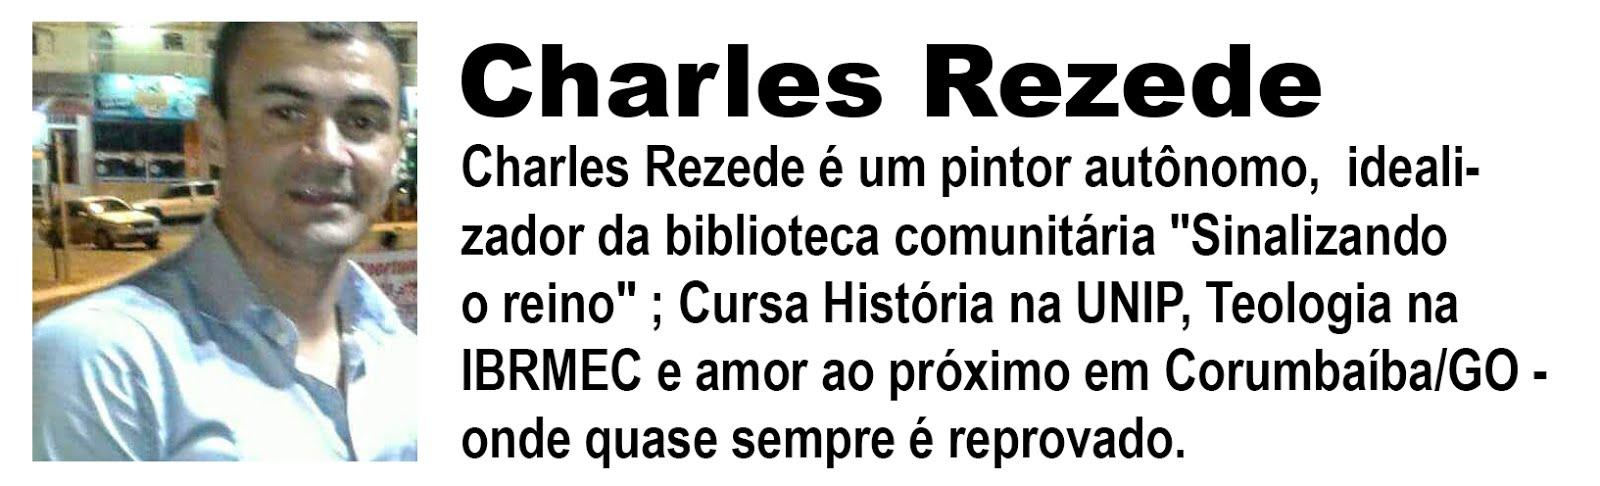 Charles Rezende